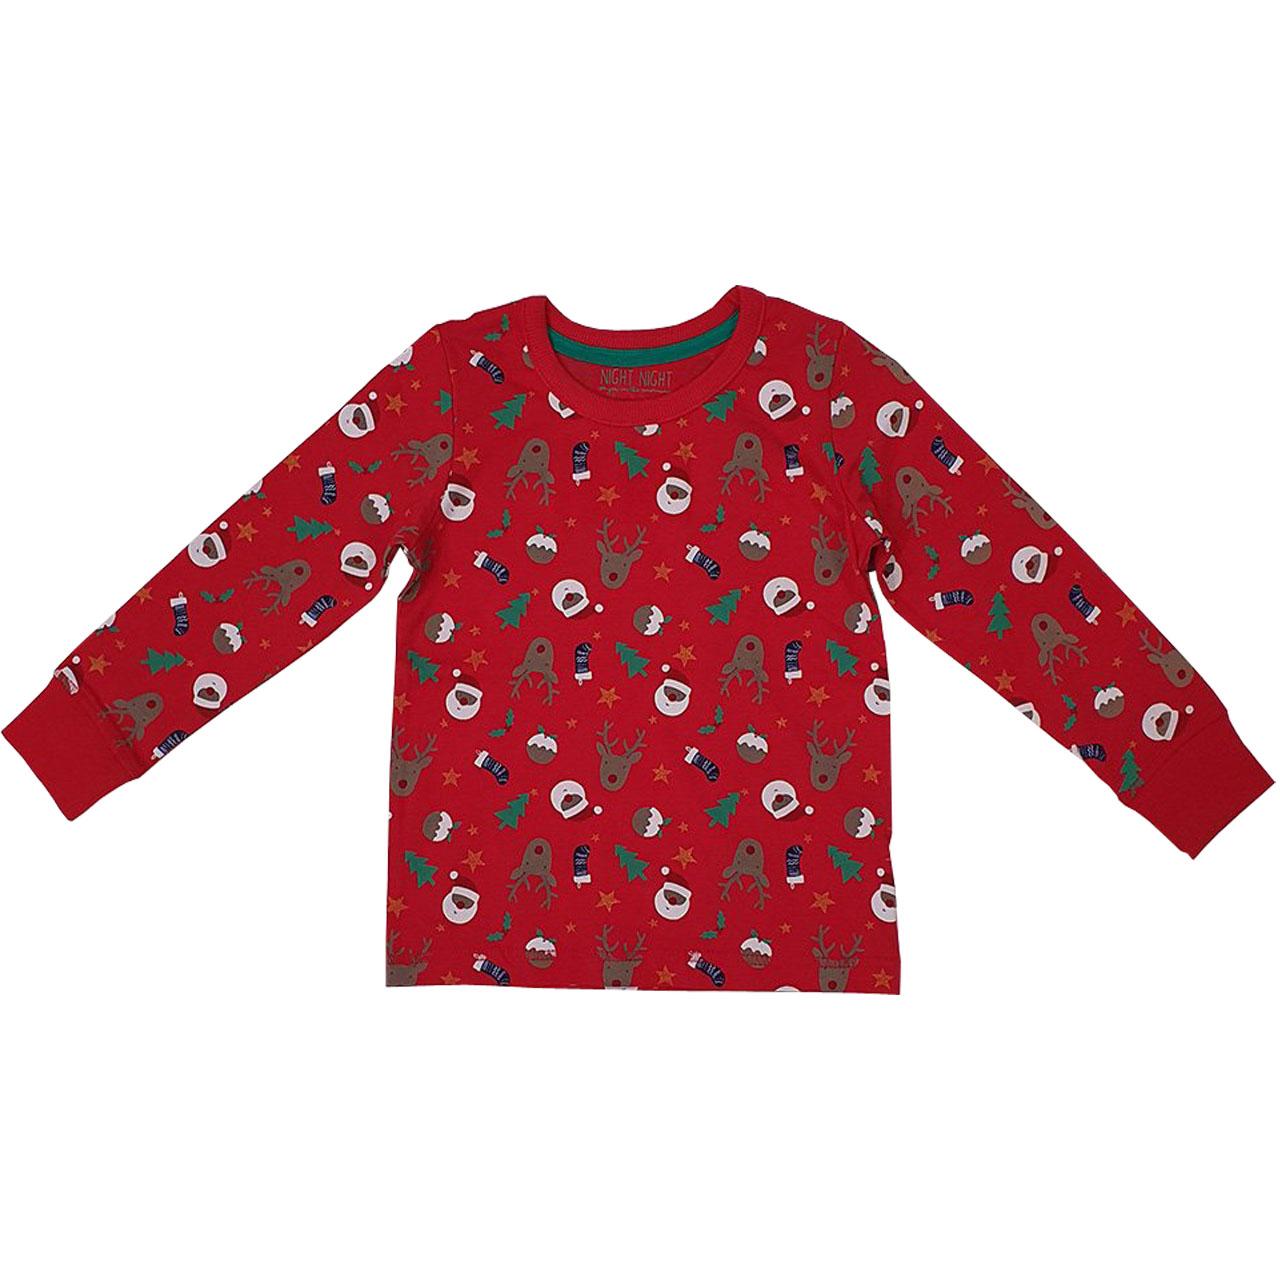 تی شرت بچگانه طرح گوزن کد 9803